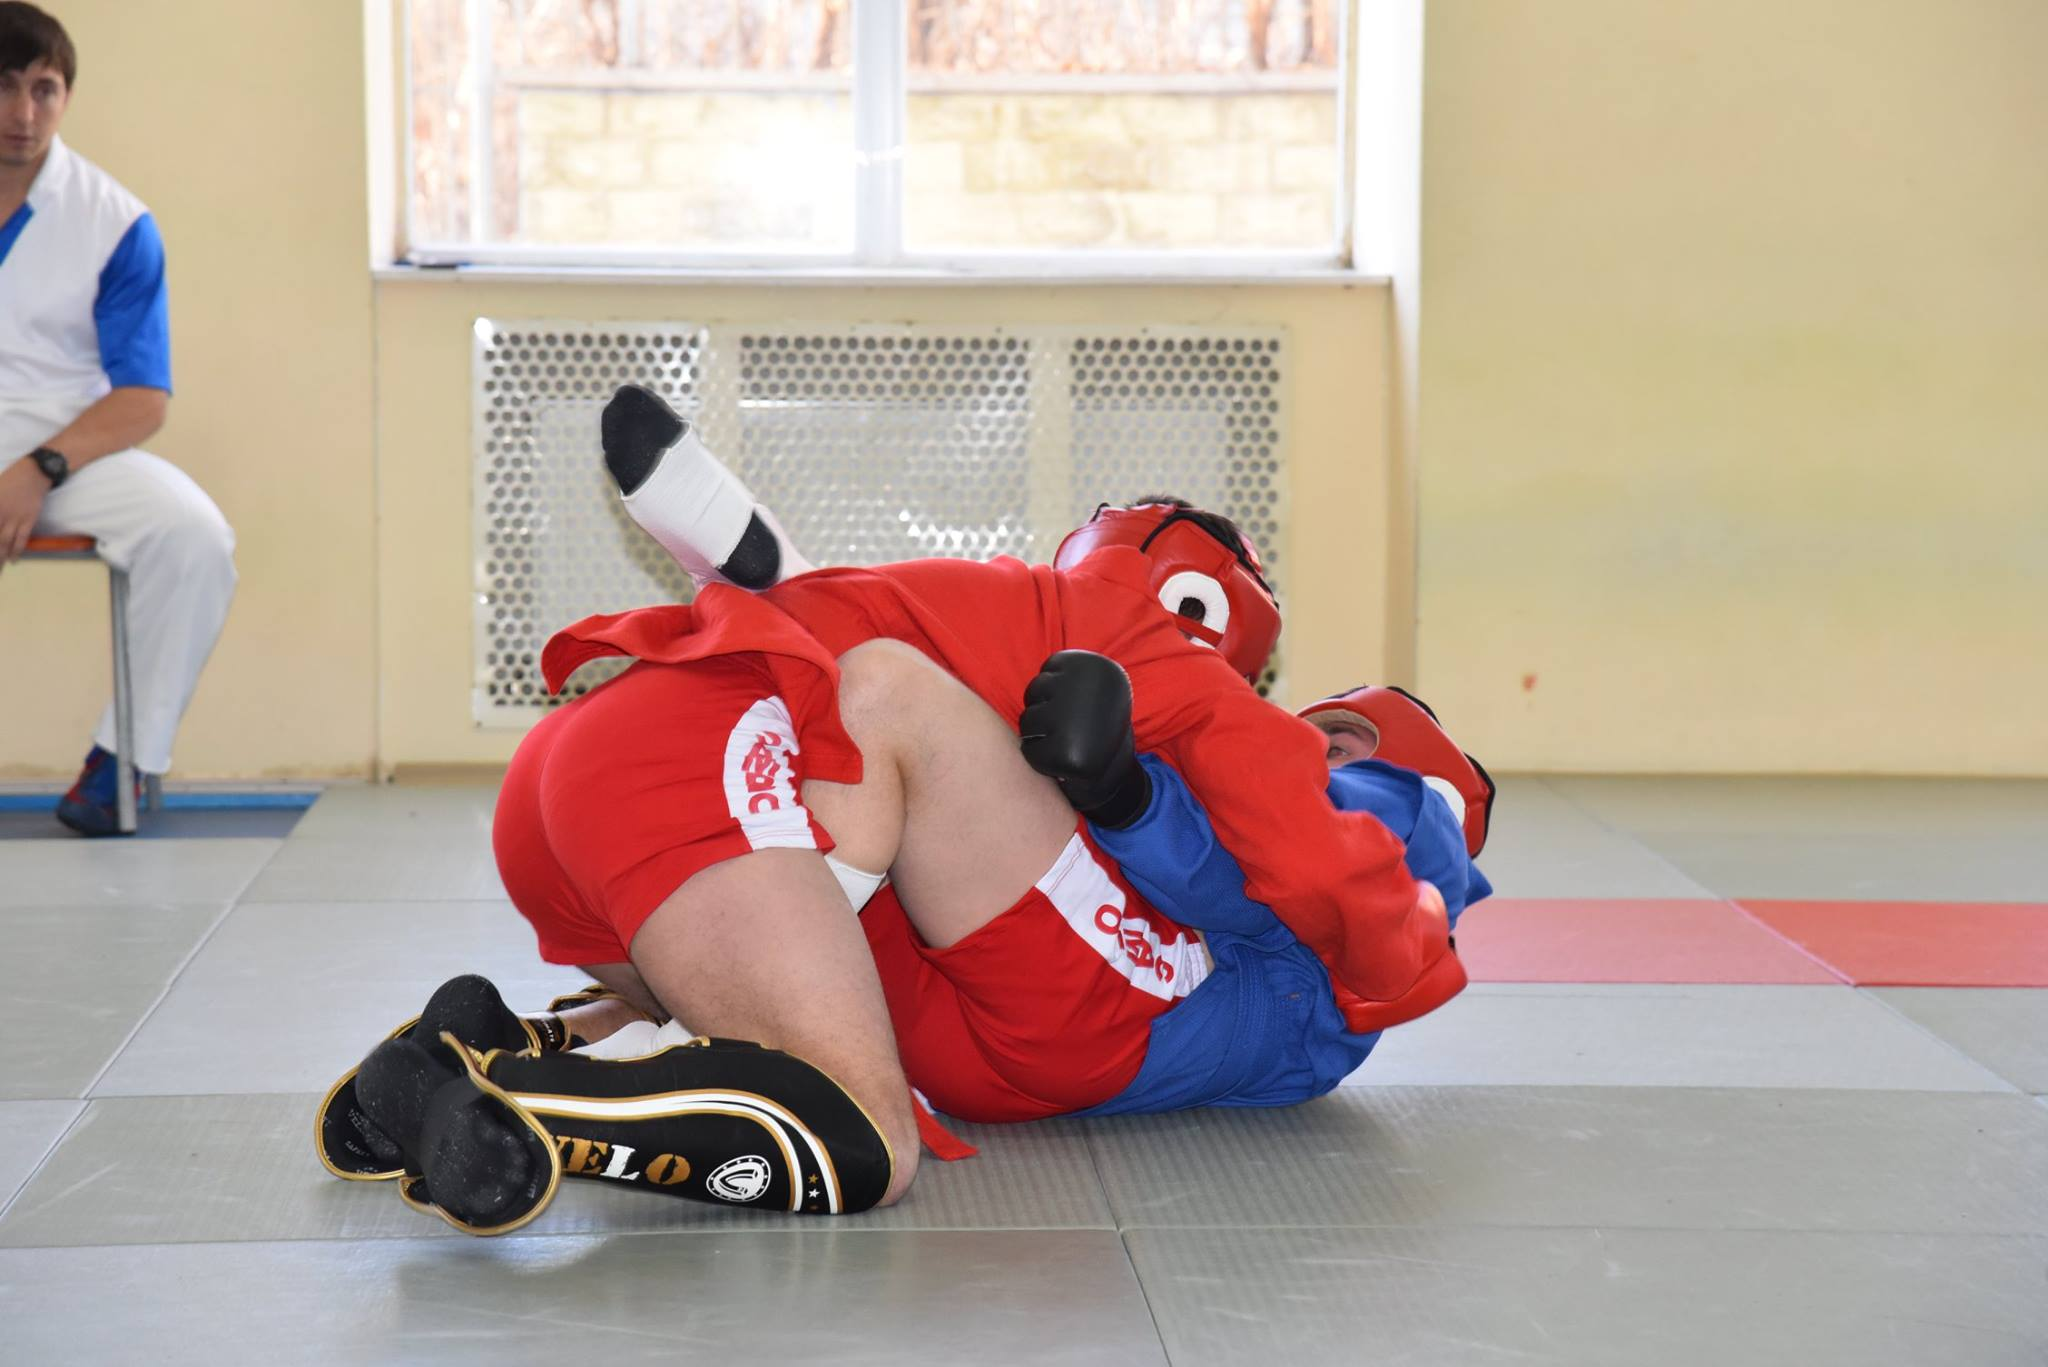 Lupta corp la corp din cadrul Spartachiadei CSC Dinamo 201826